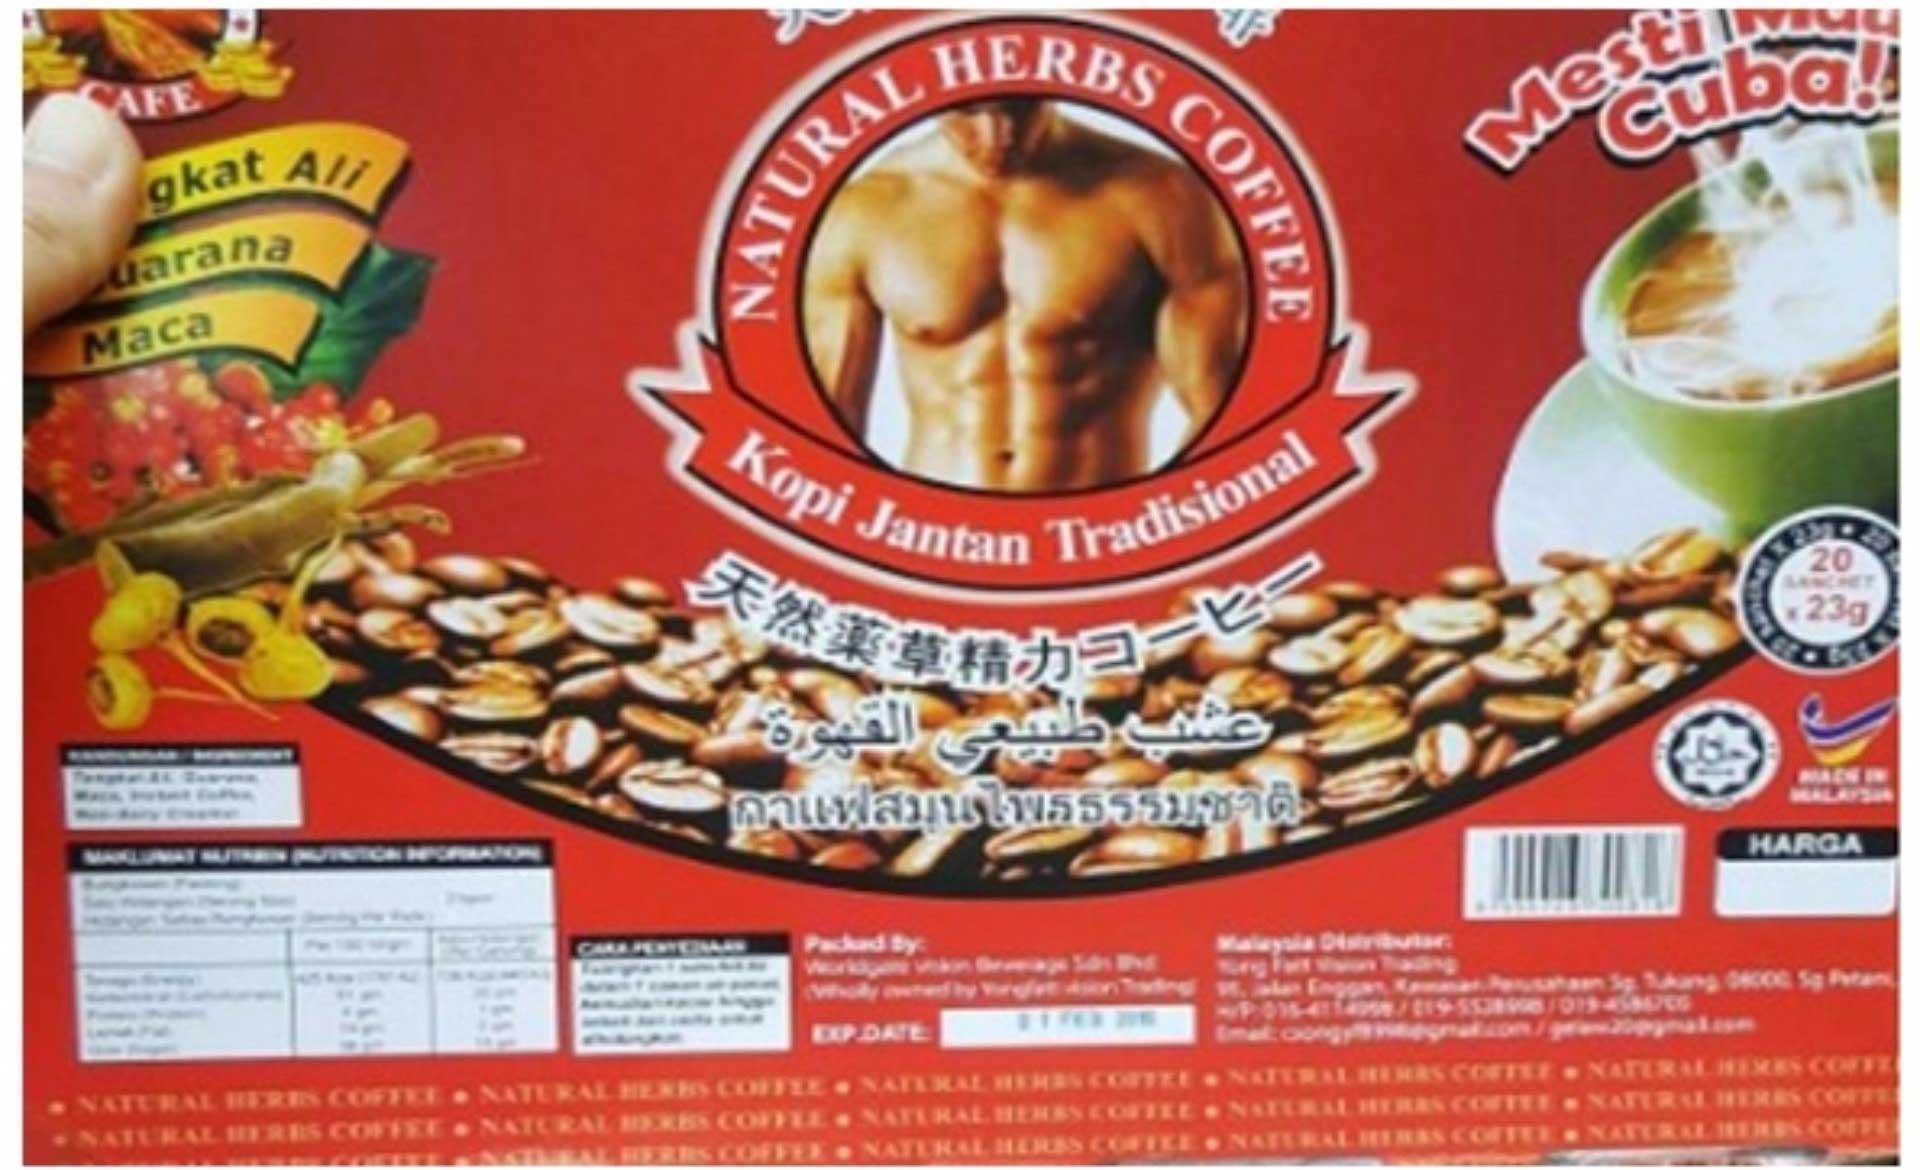 Natural Herbs Coffee Tongkat Ali กาแฟผู้ชาย